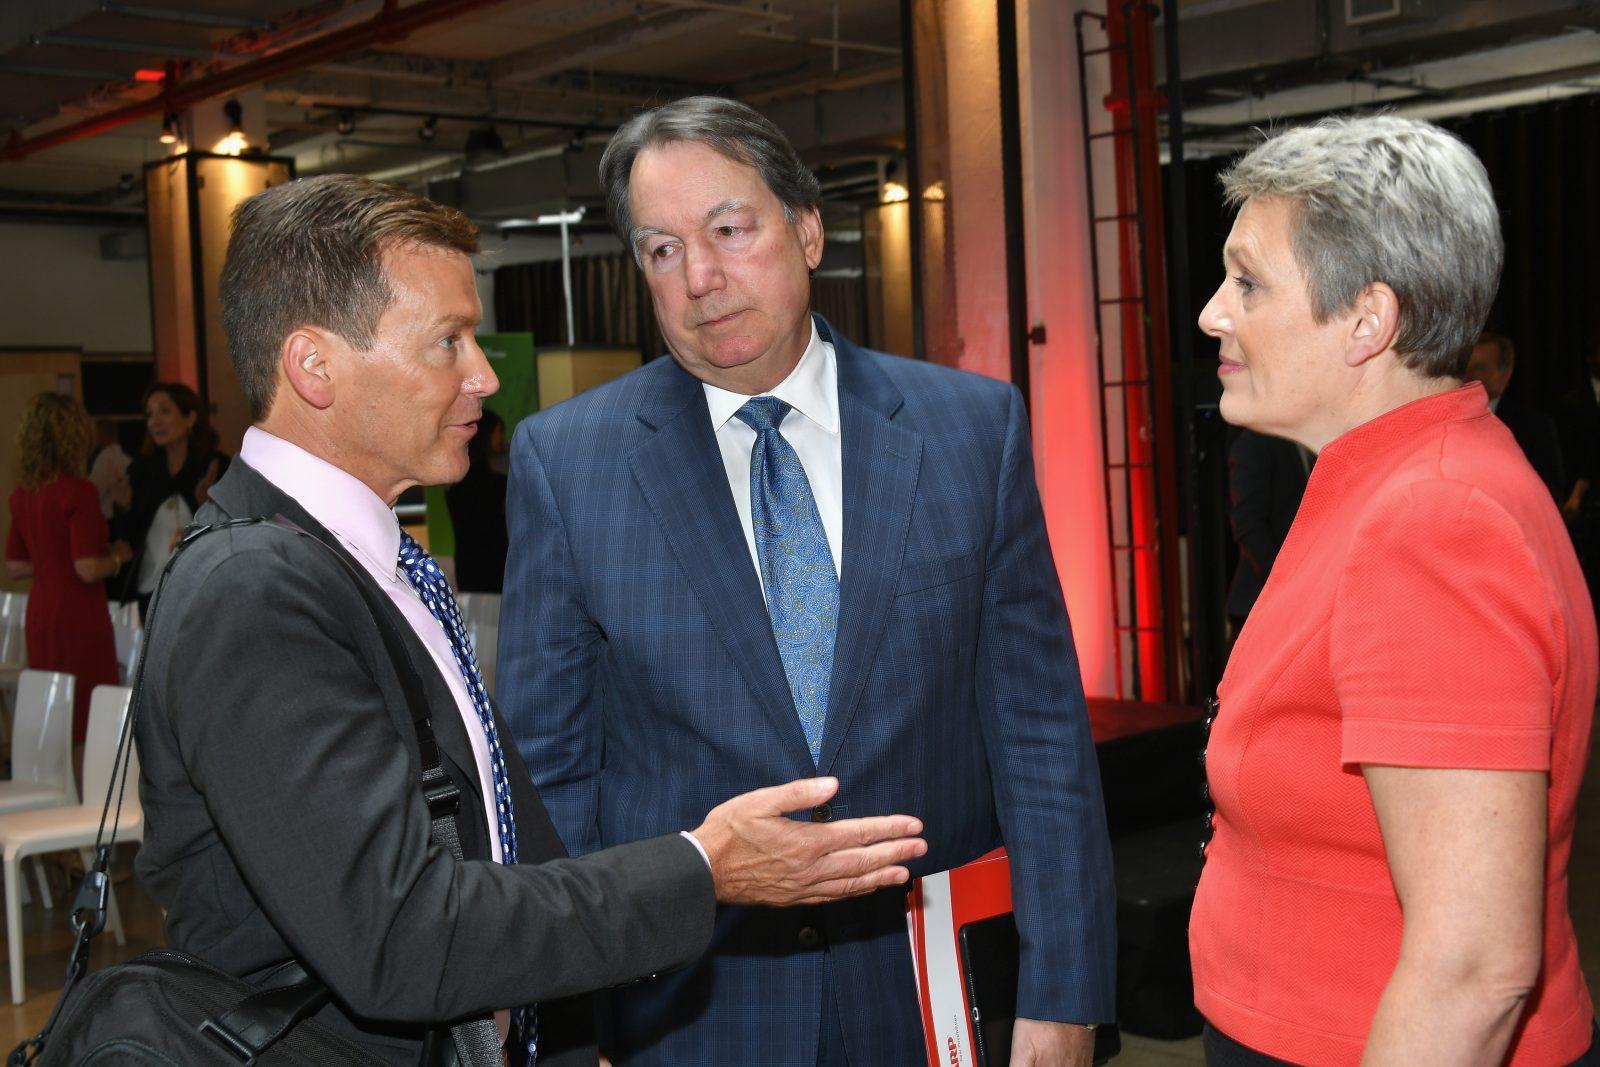 PM congratulates vaccine taskforce boss Kate Bingham amid ...